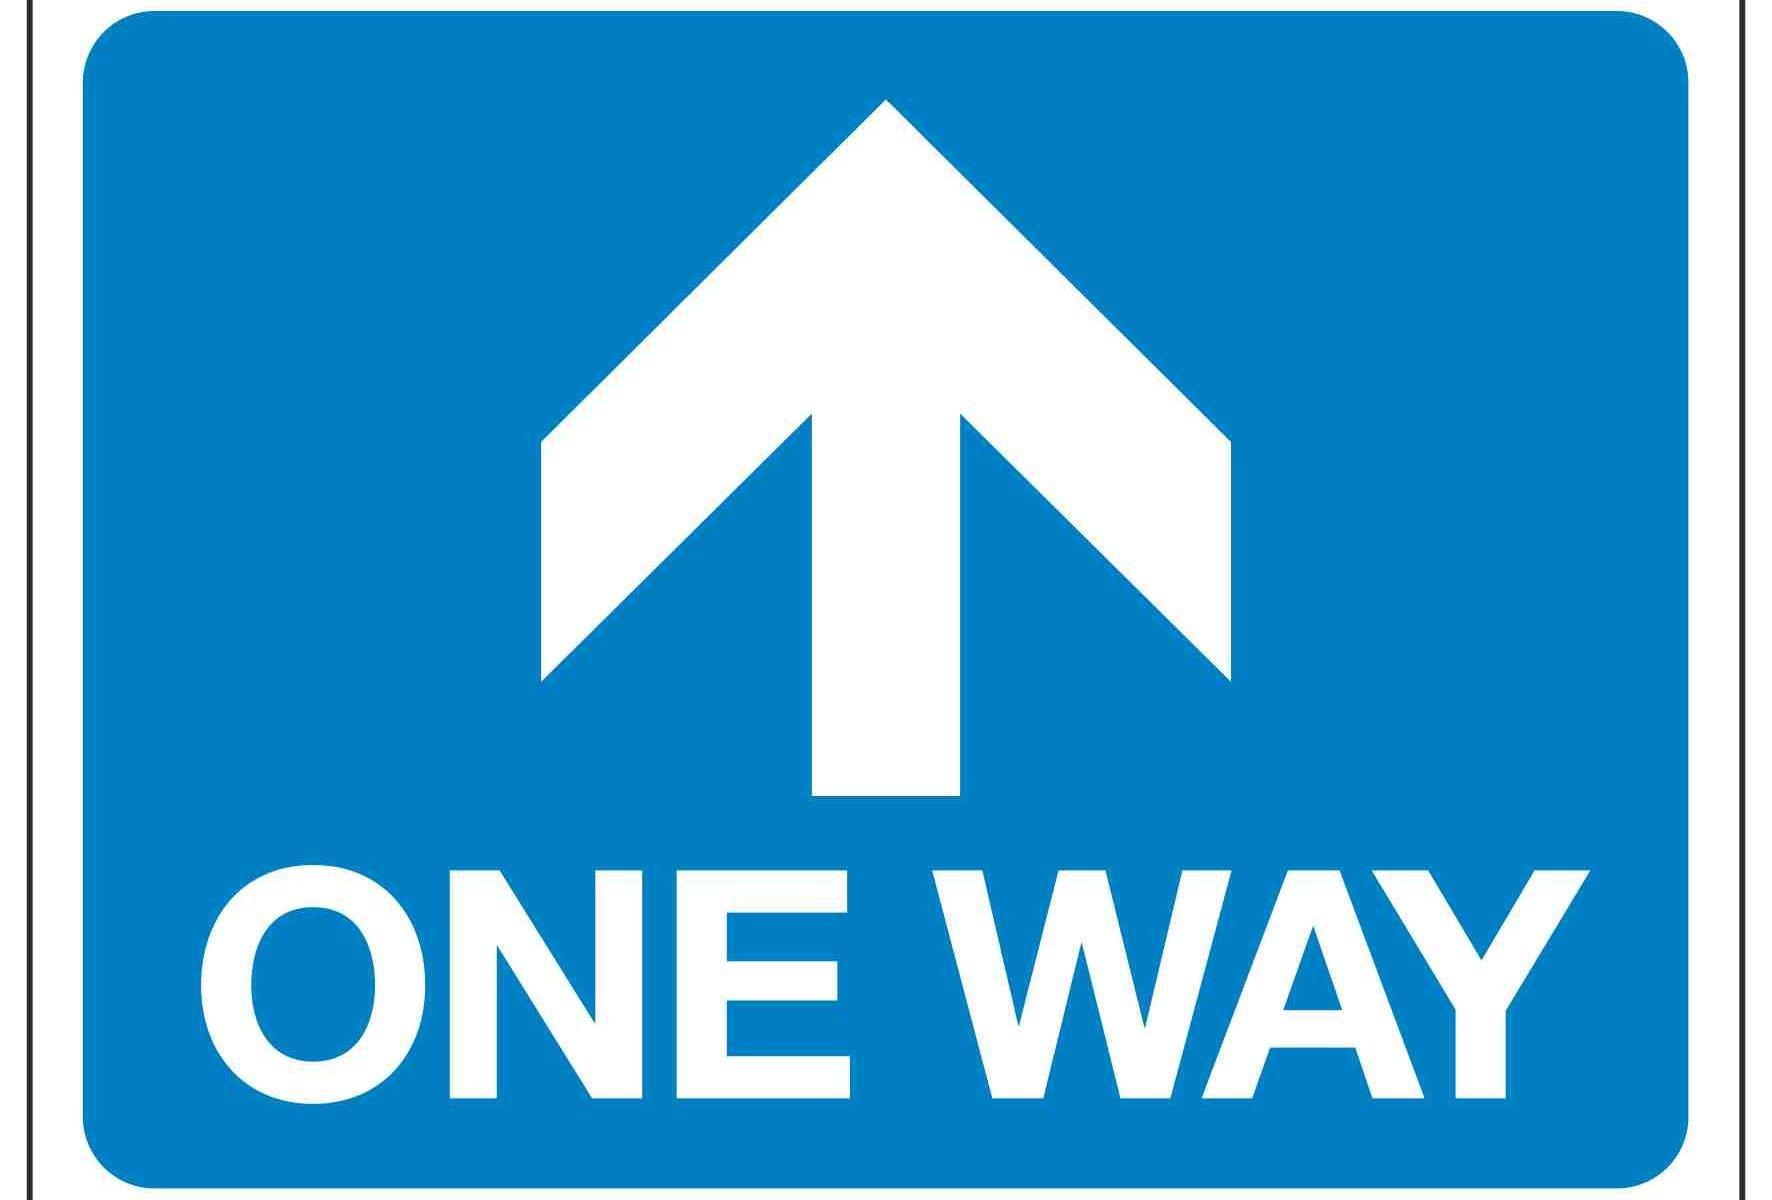 ONE WAY (Arrow pointing forwards)